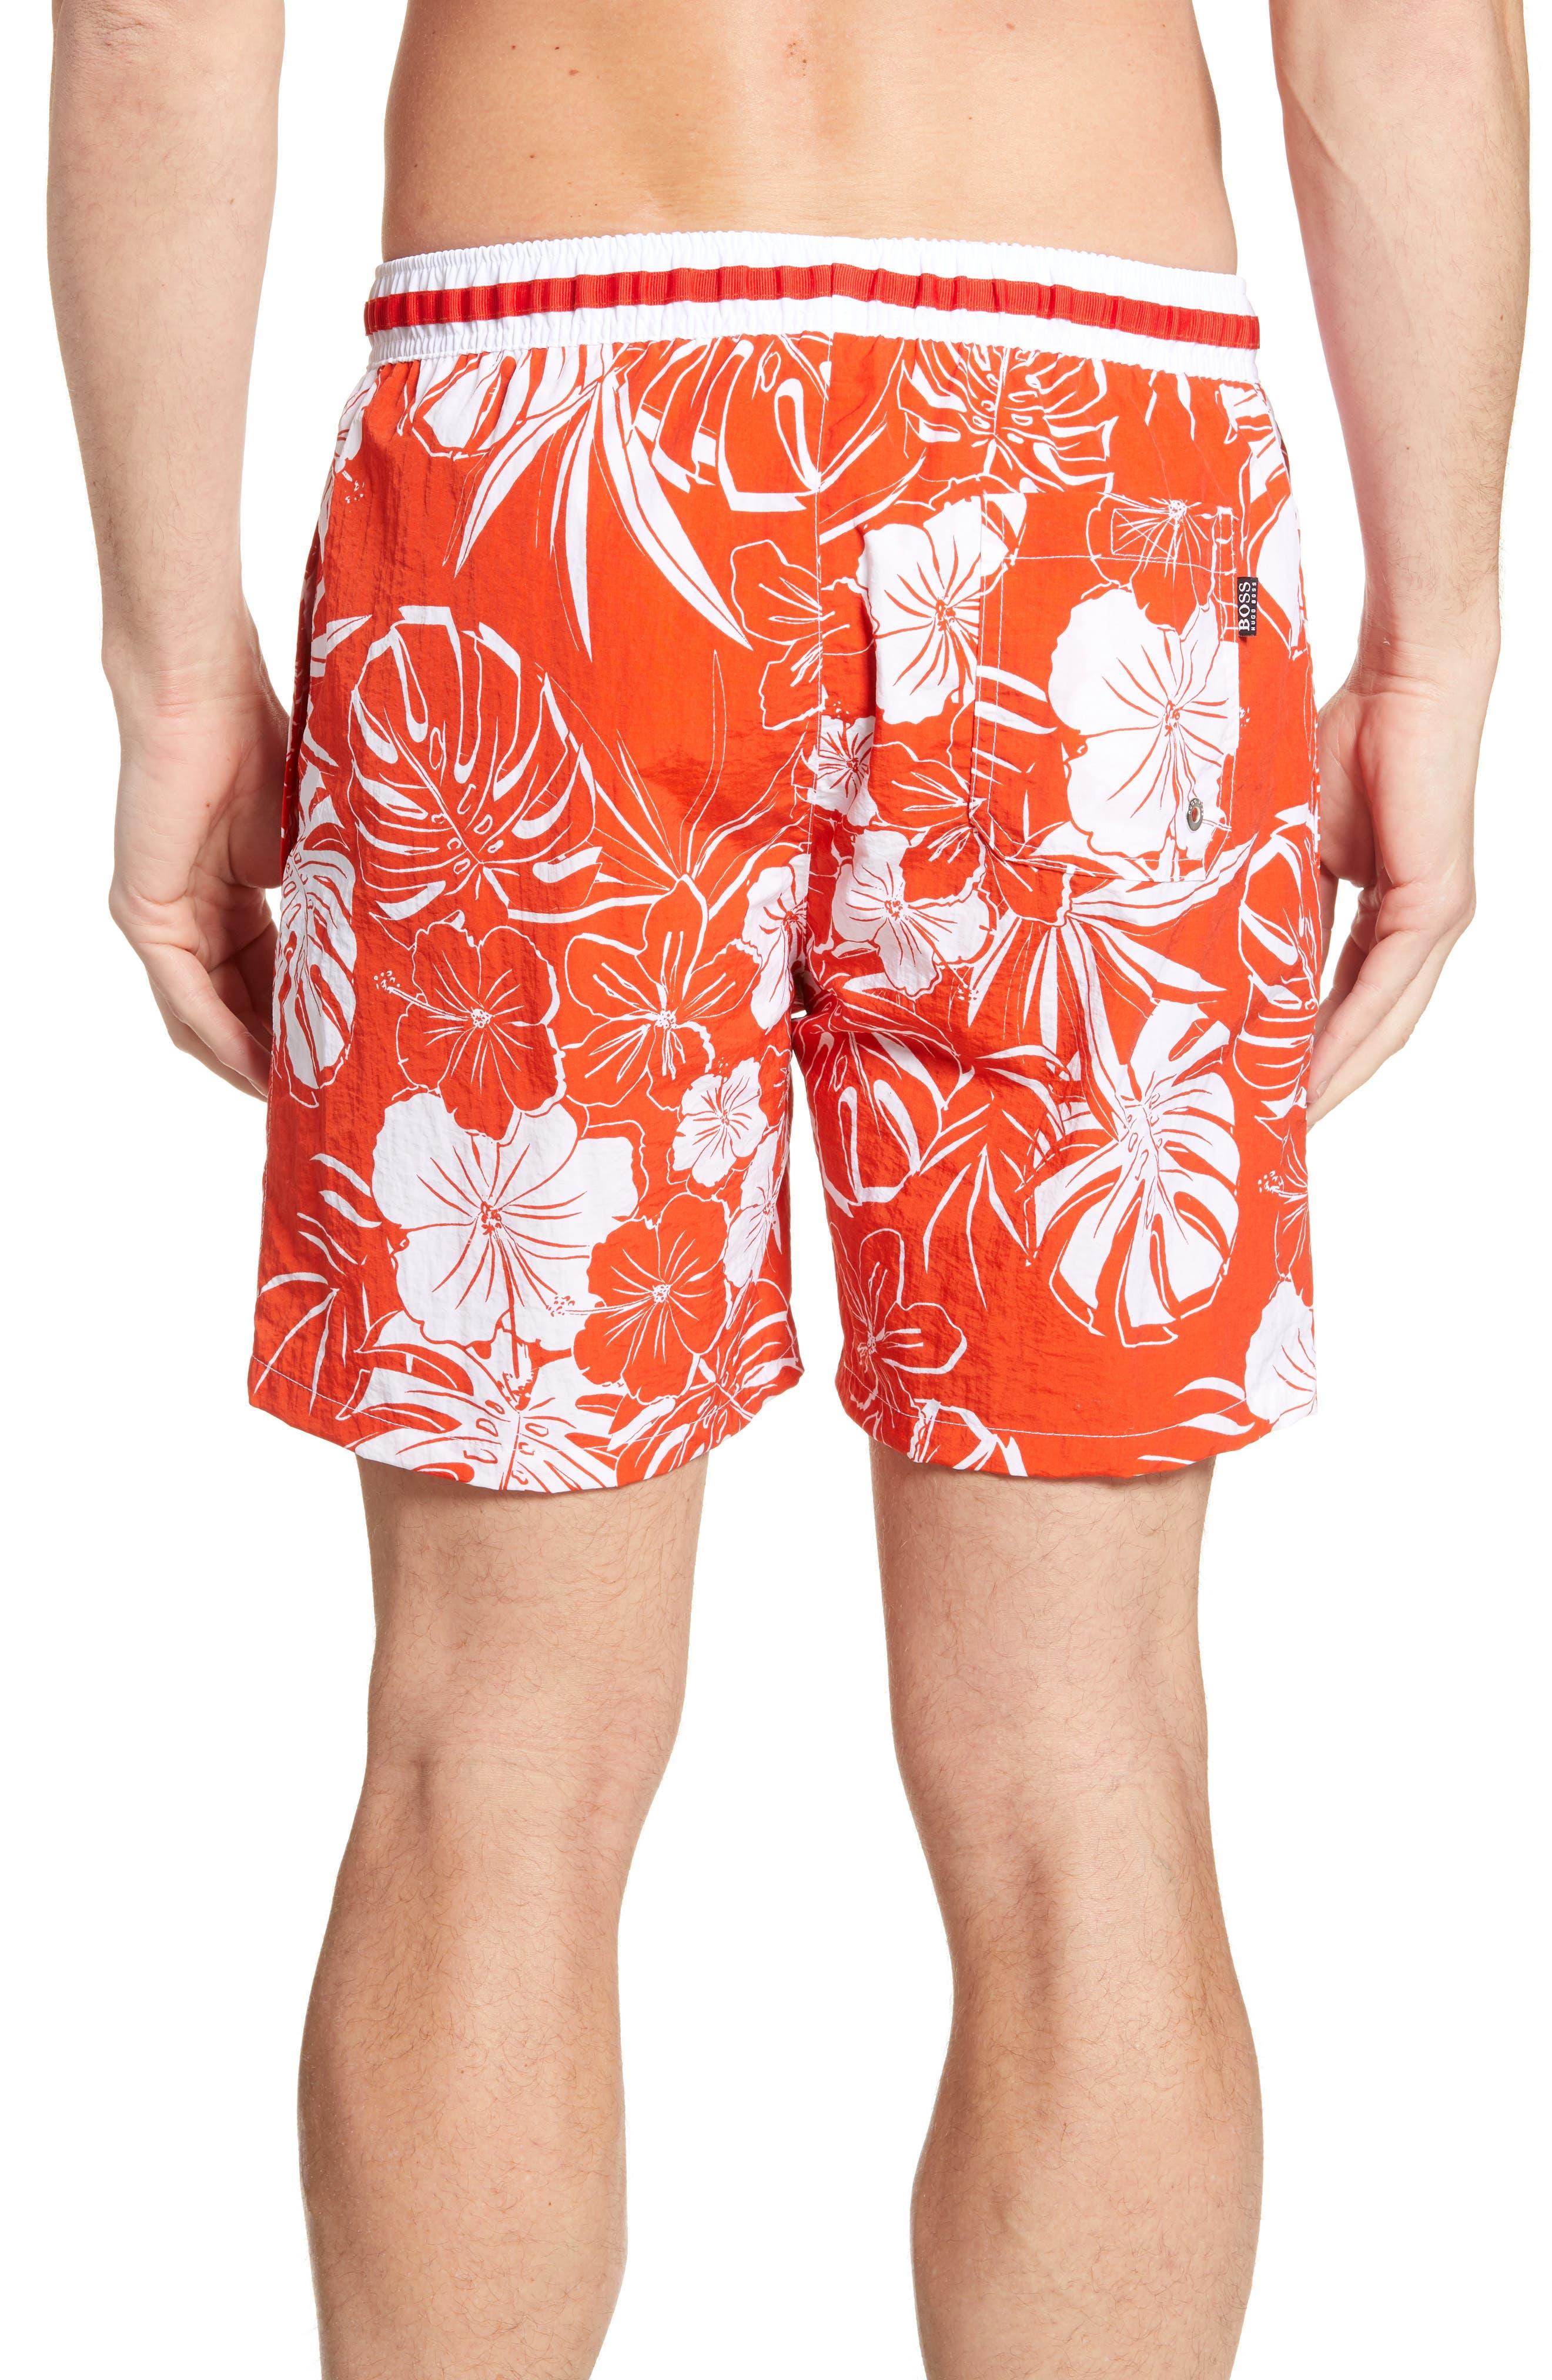 dad6fa9962 Men's BOSS Swimwear, Boardshorts & Swim Trunks | Nordstrom